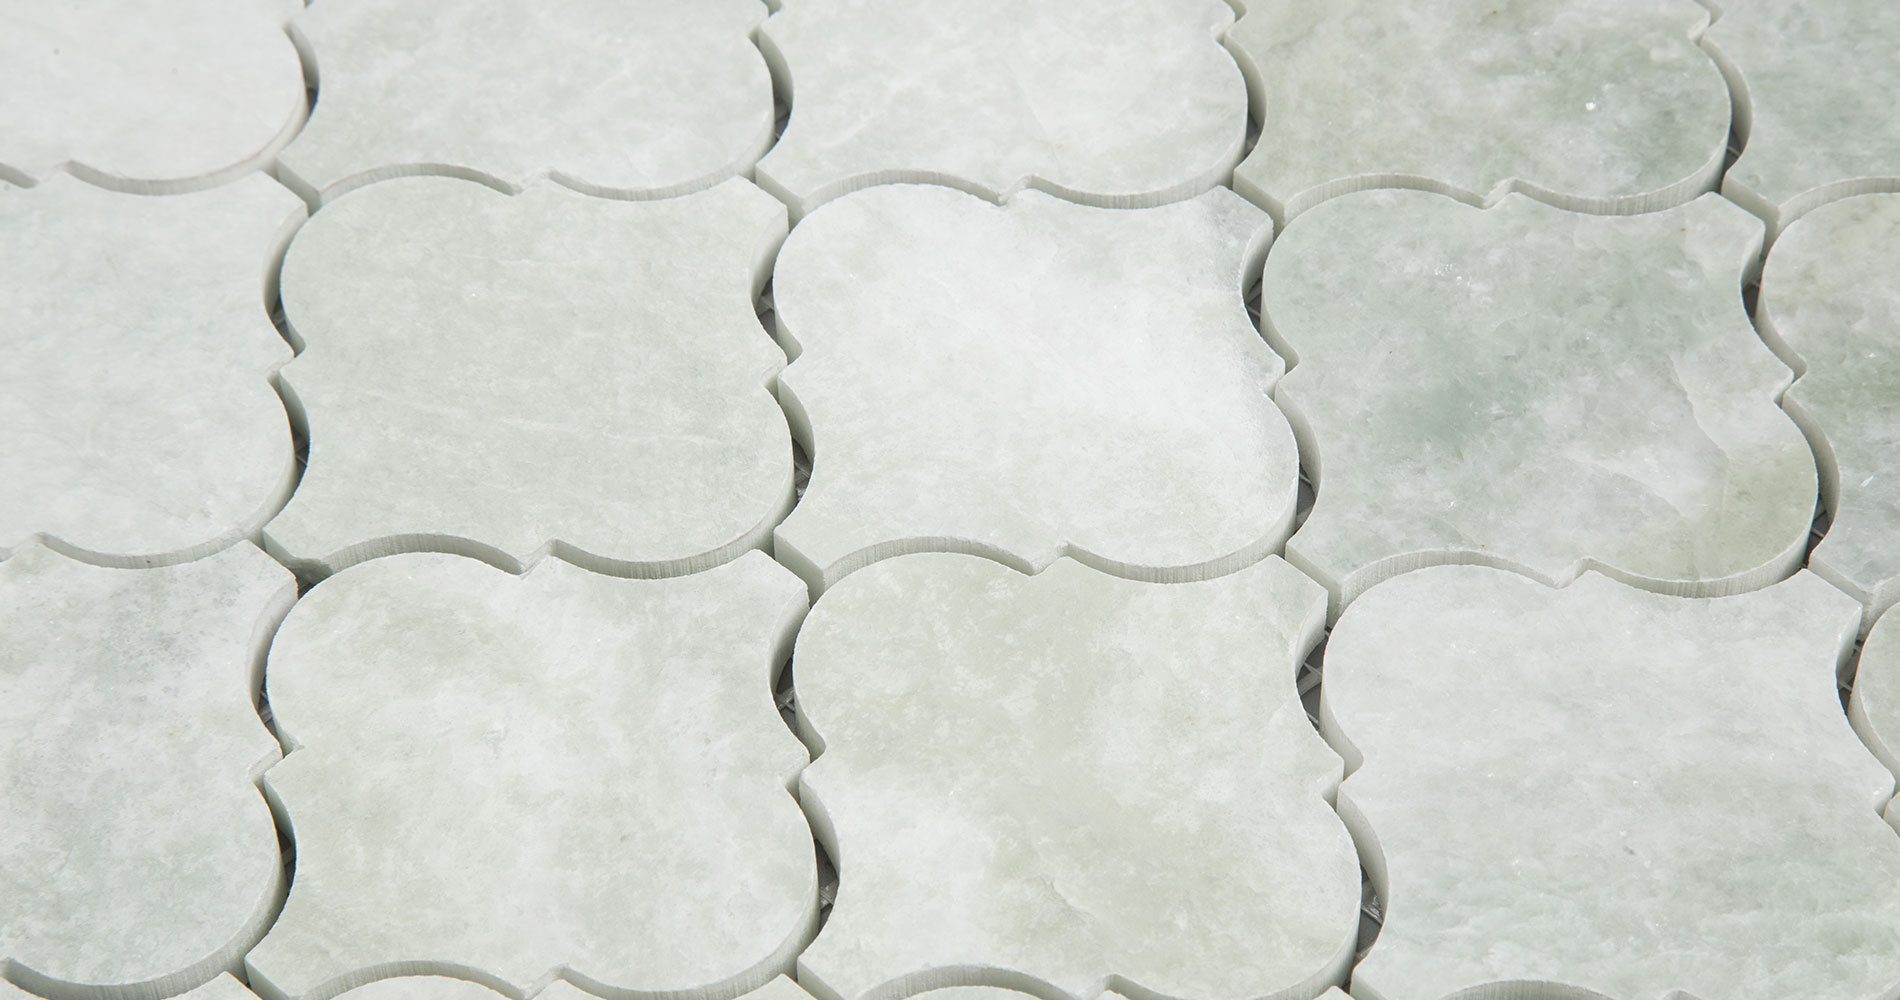 centurymosaic-ming-green-Arabesque-Marble-Mosaic-Tile-Collection-2